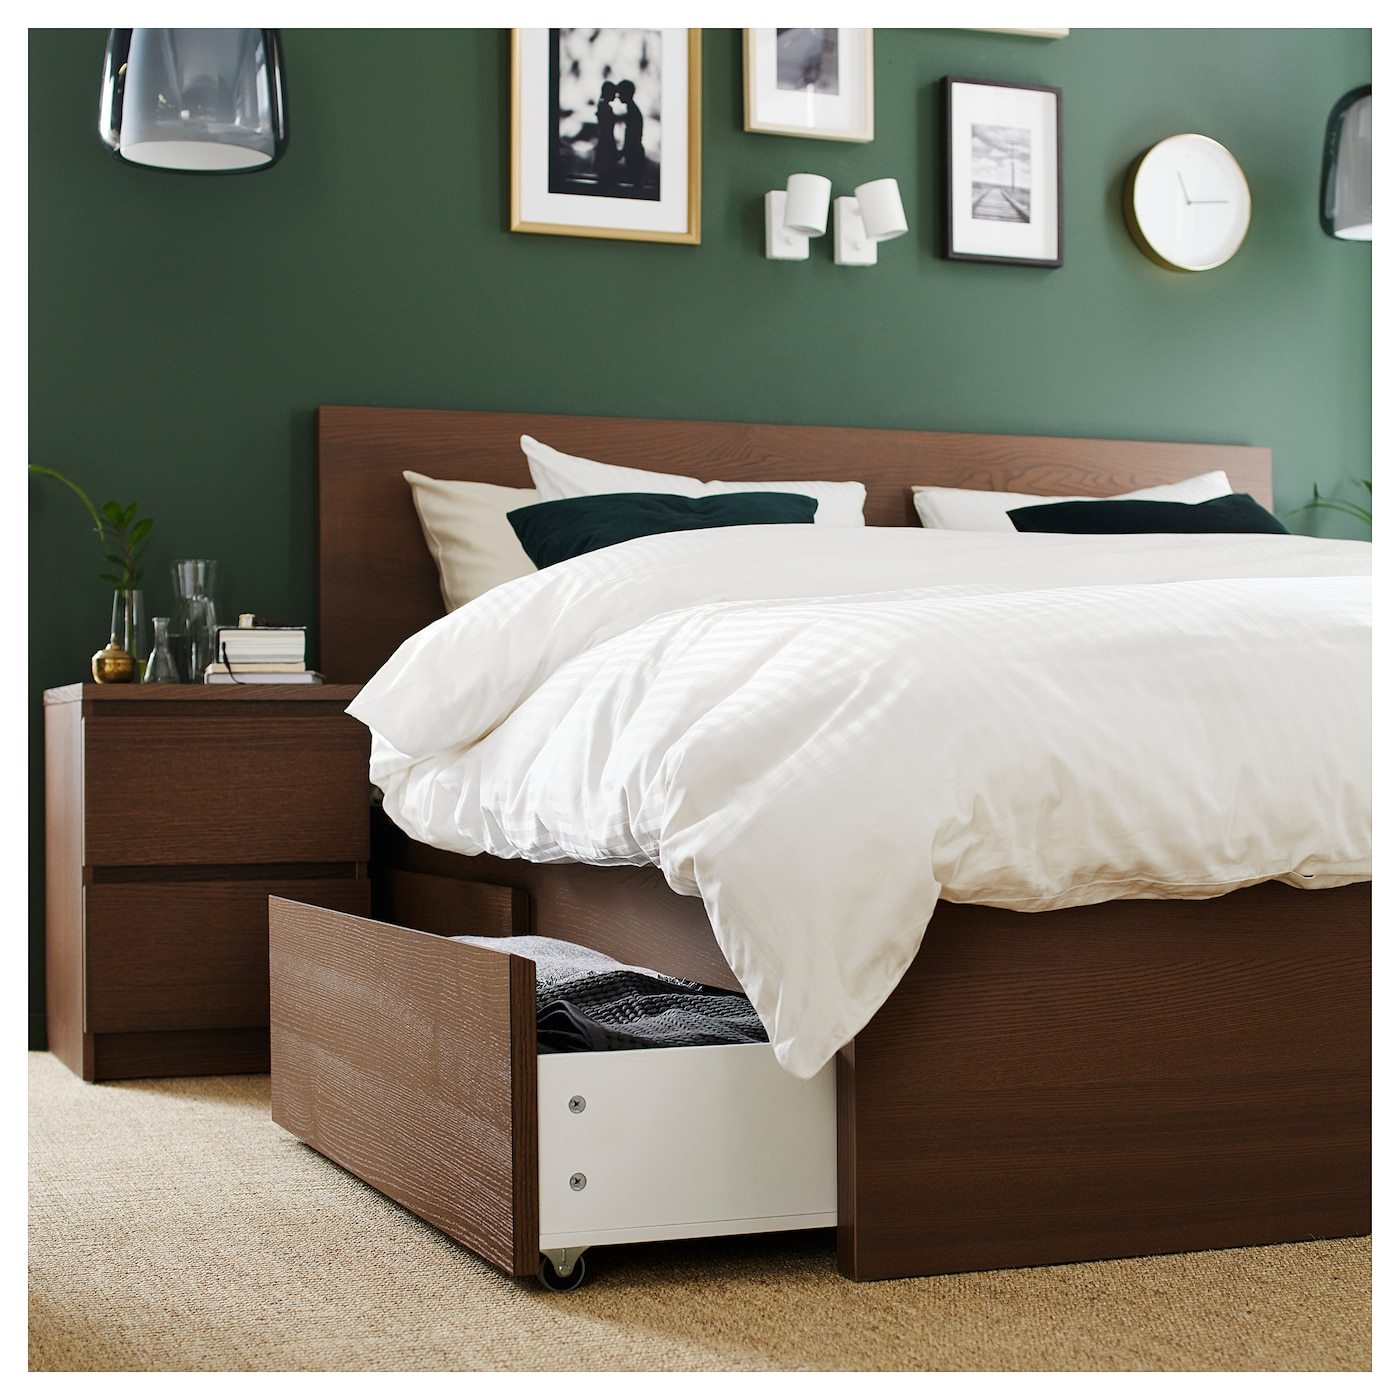 MALM Rangement pr lit haut, blanc, 200 cm IKEA